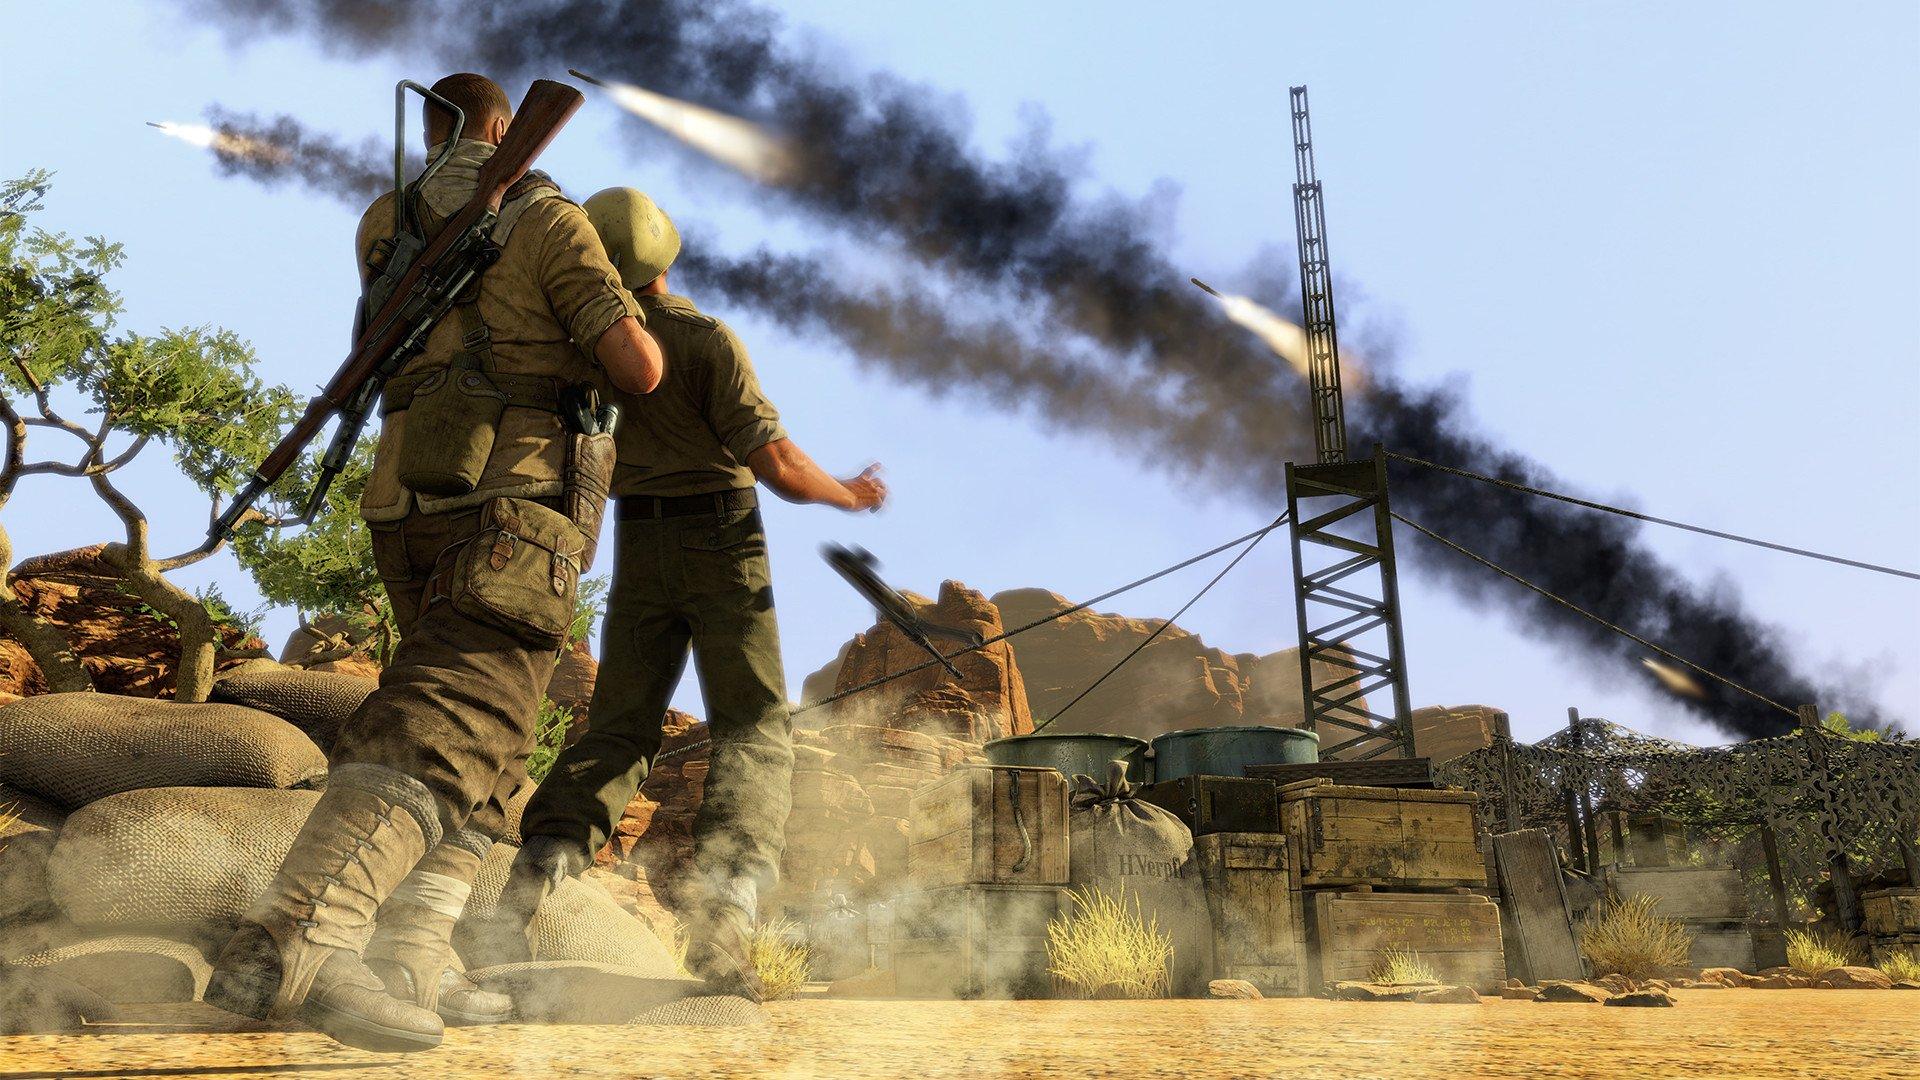 sniper elite 3 2537597 تصاویر جدیدی از Sniper Elite 3 منتشر شد : بیابان گردی در آفریقا